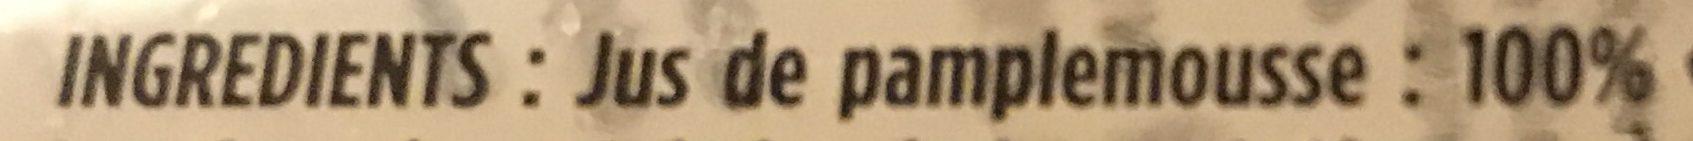 Jus Pamplemousse - Ingredients - fr